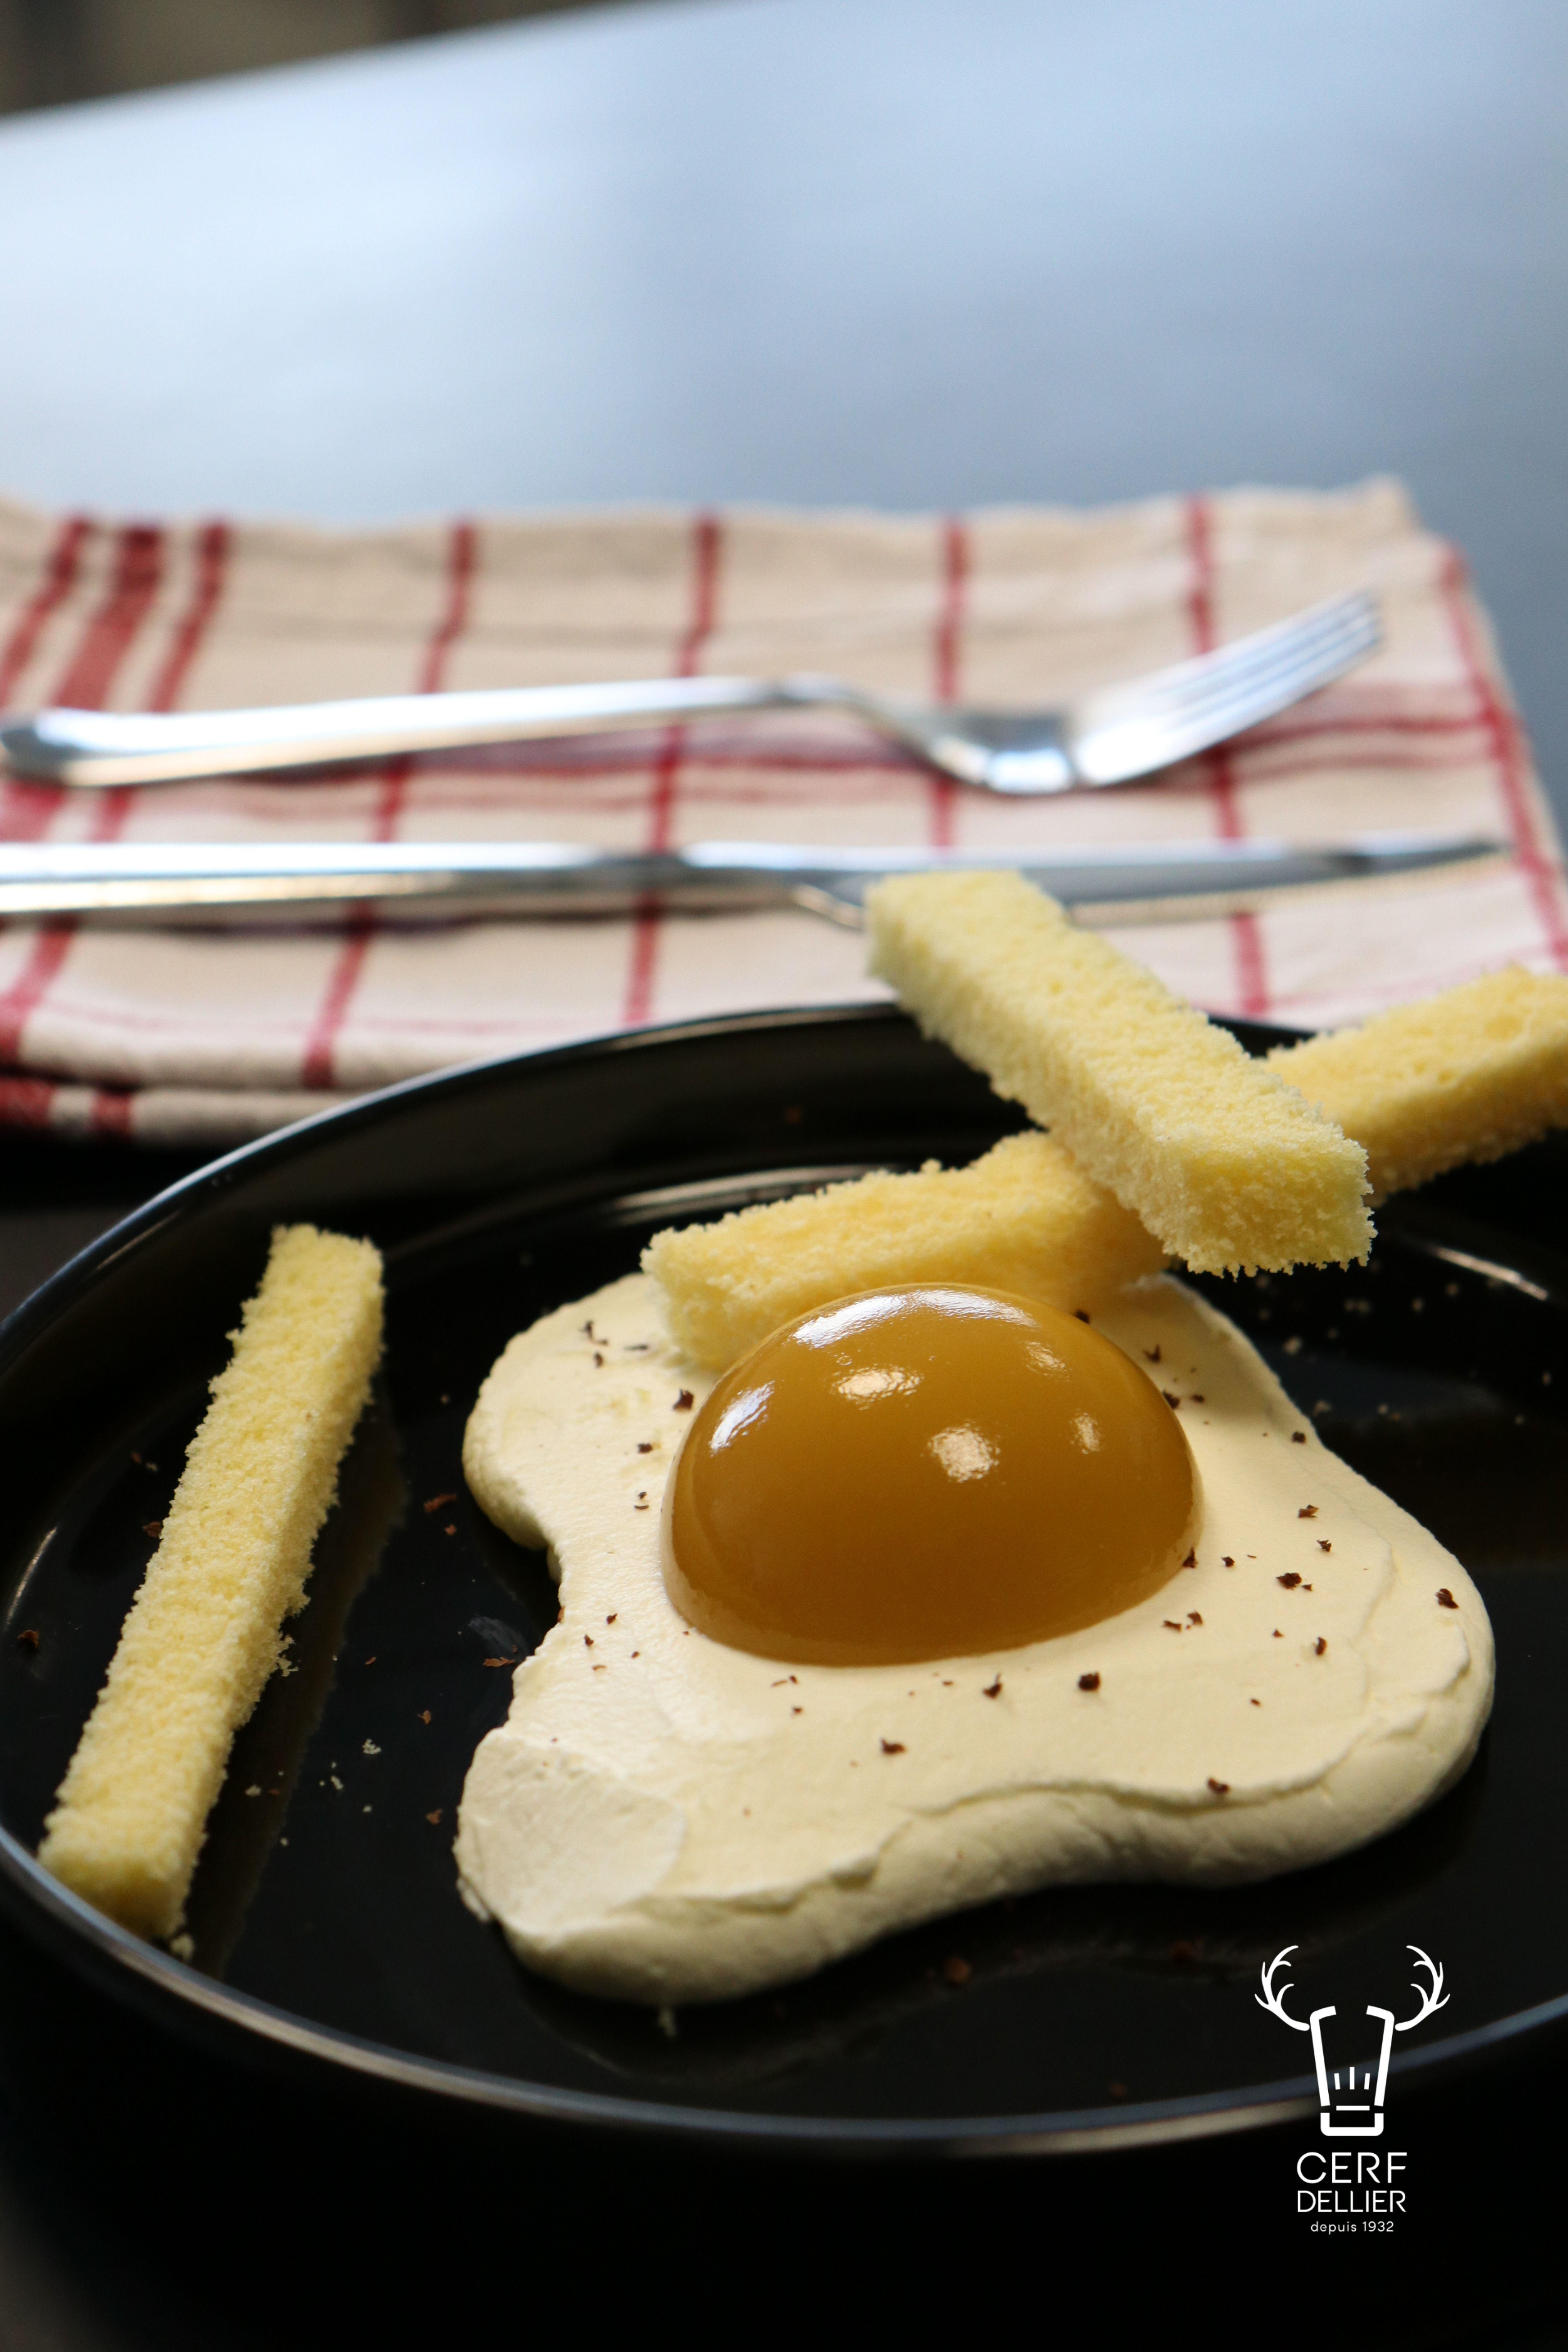 Ceci nest pas un oeuf au plat Dessert trompe loeil #gateautrompeloeil Avec c #gateautrompeloeil Ceci nest pas un oeuf au plat Dessert trompe loeil #gateautrompeloeil Avec c